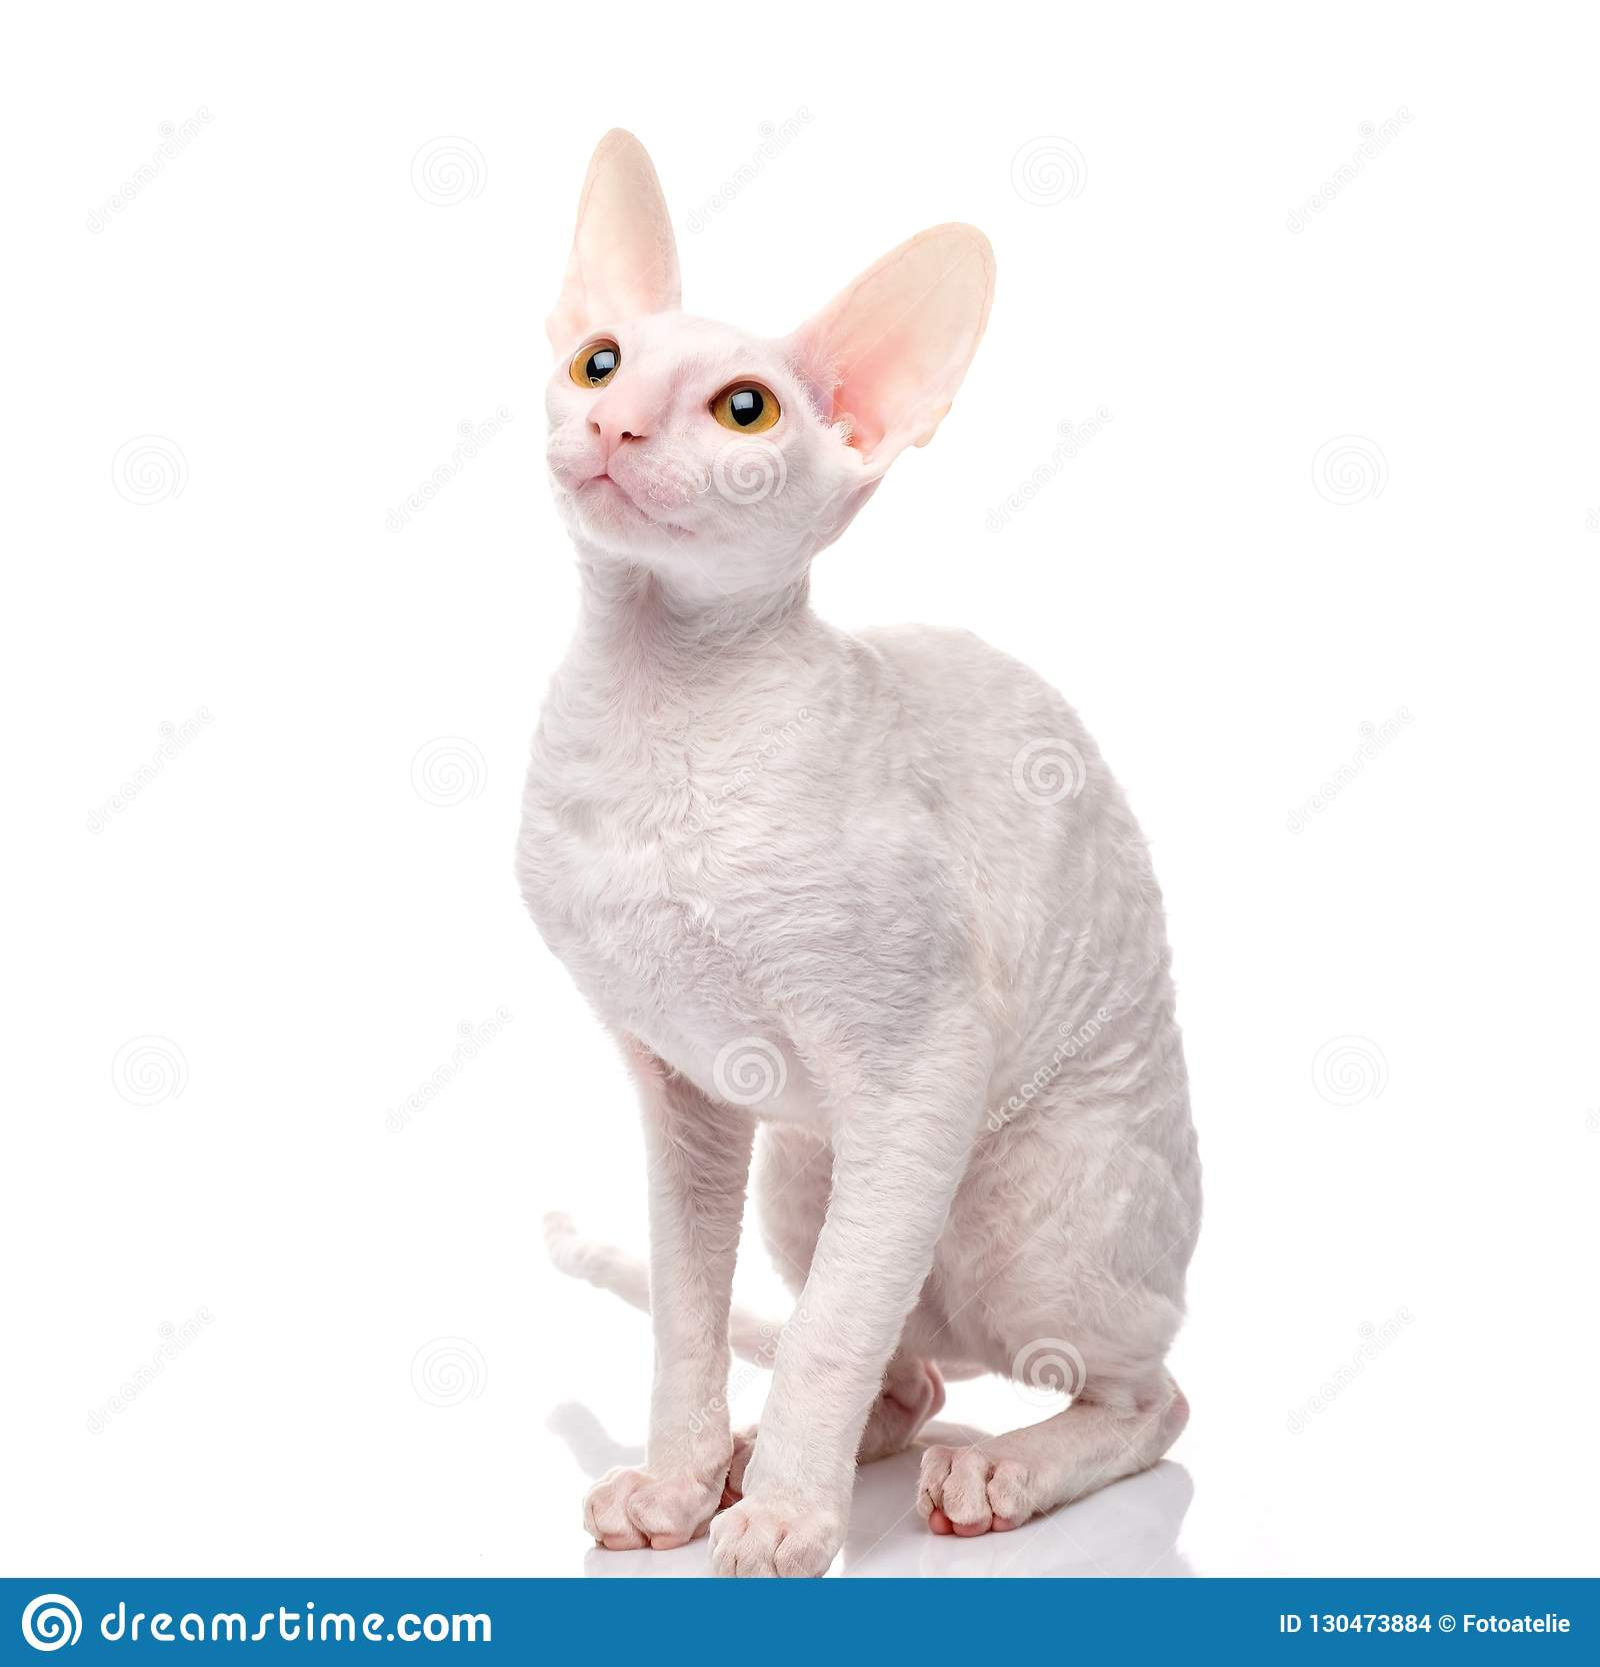 Thoroughbred White Cornish Rex Cat on white background.